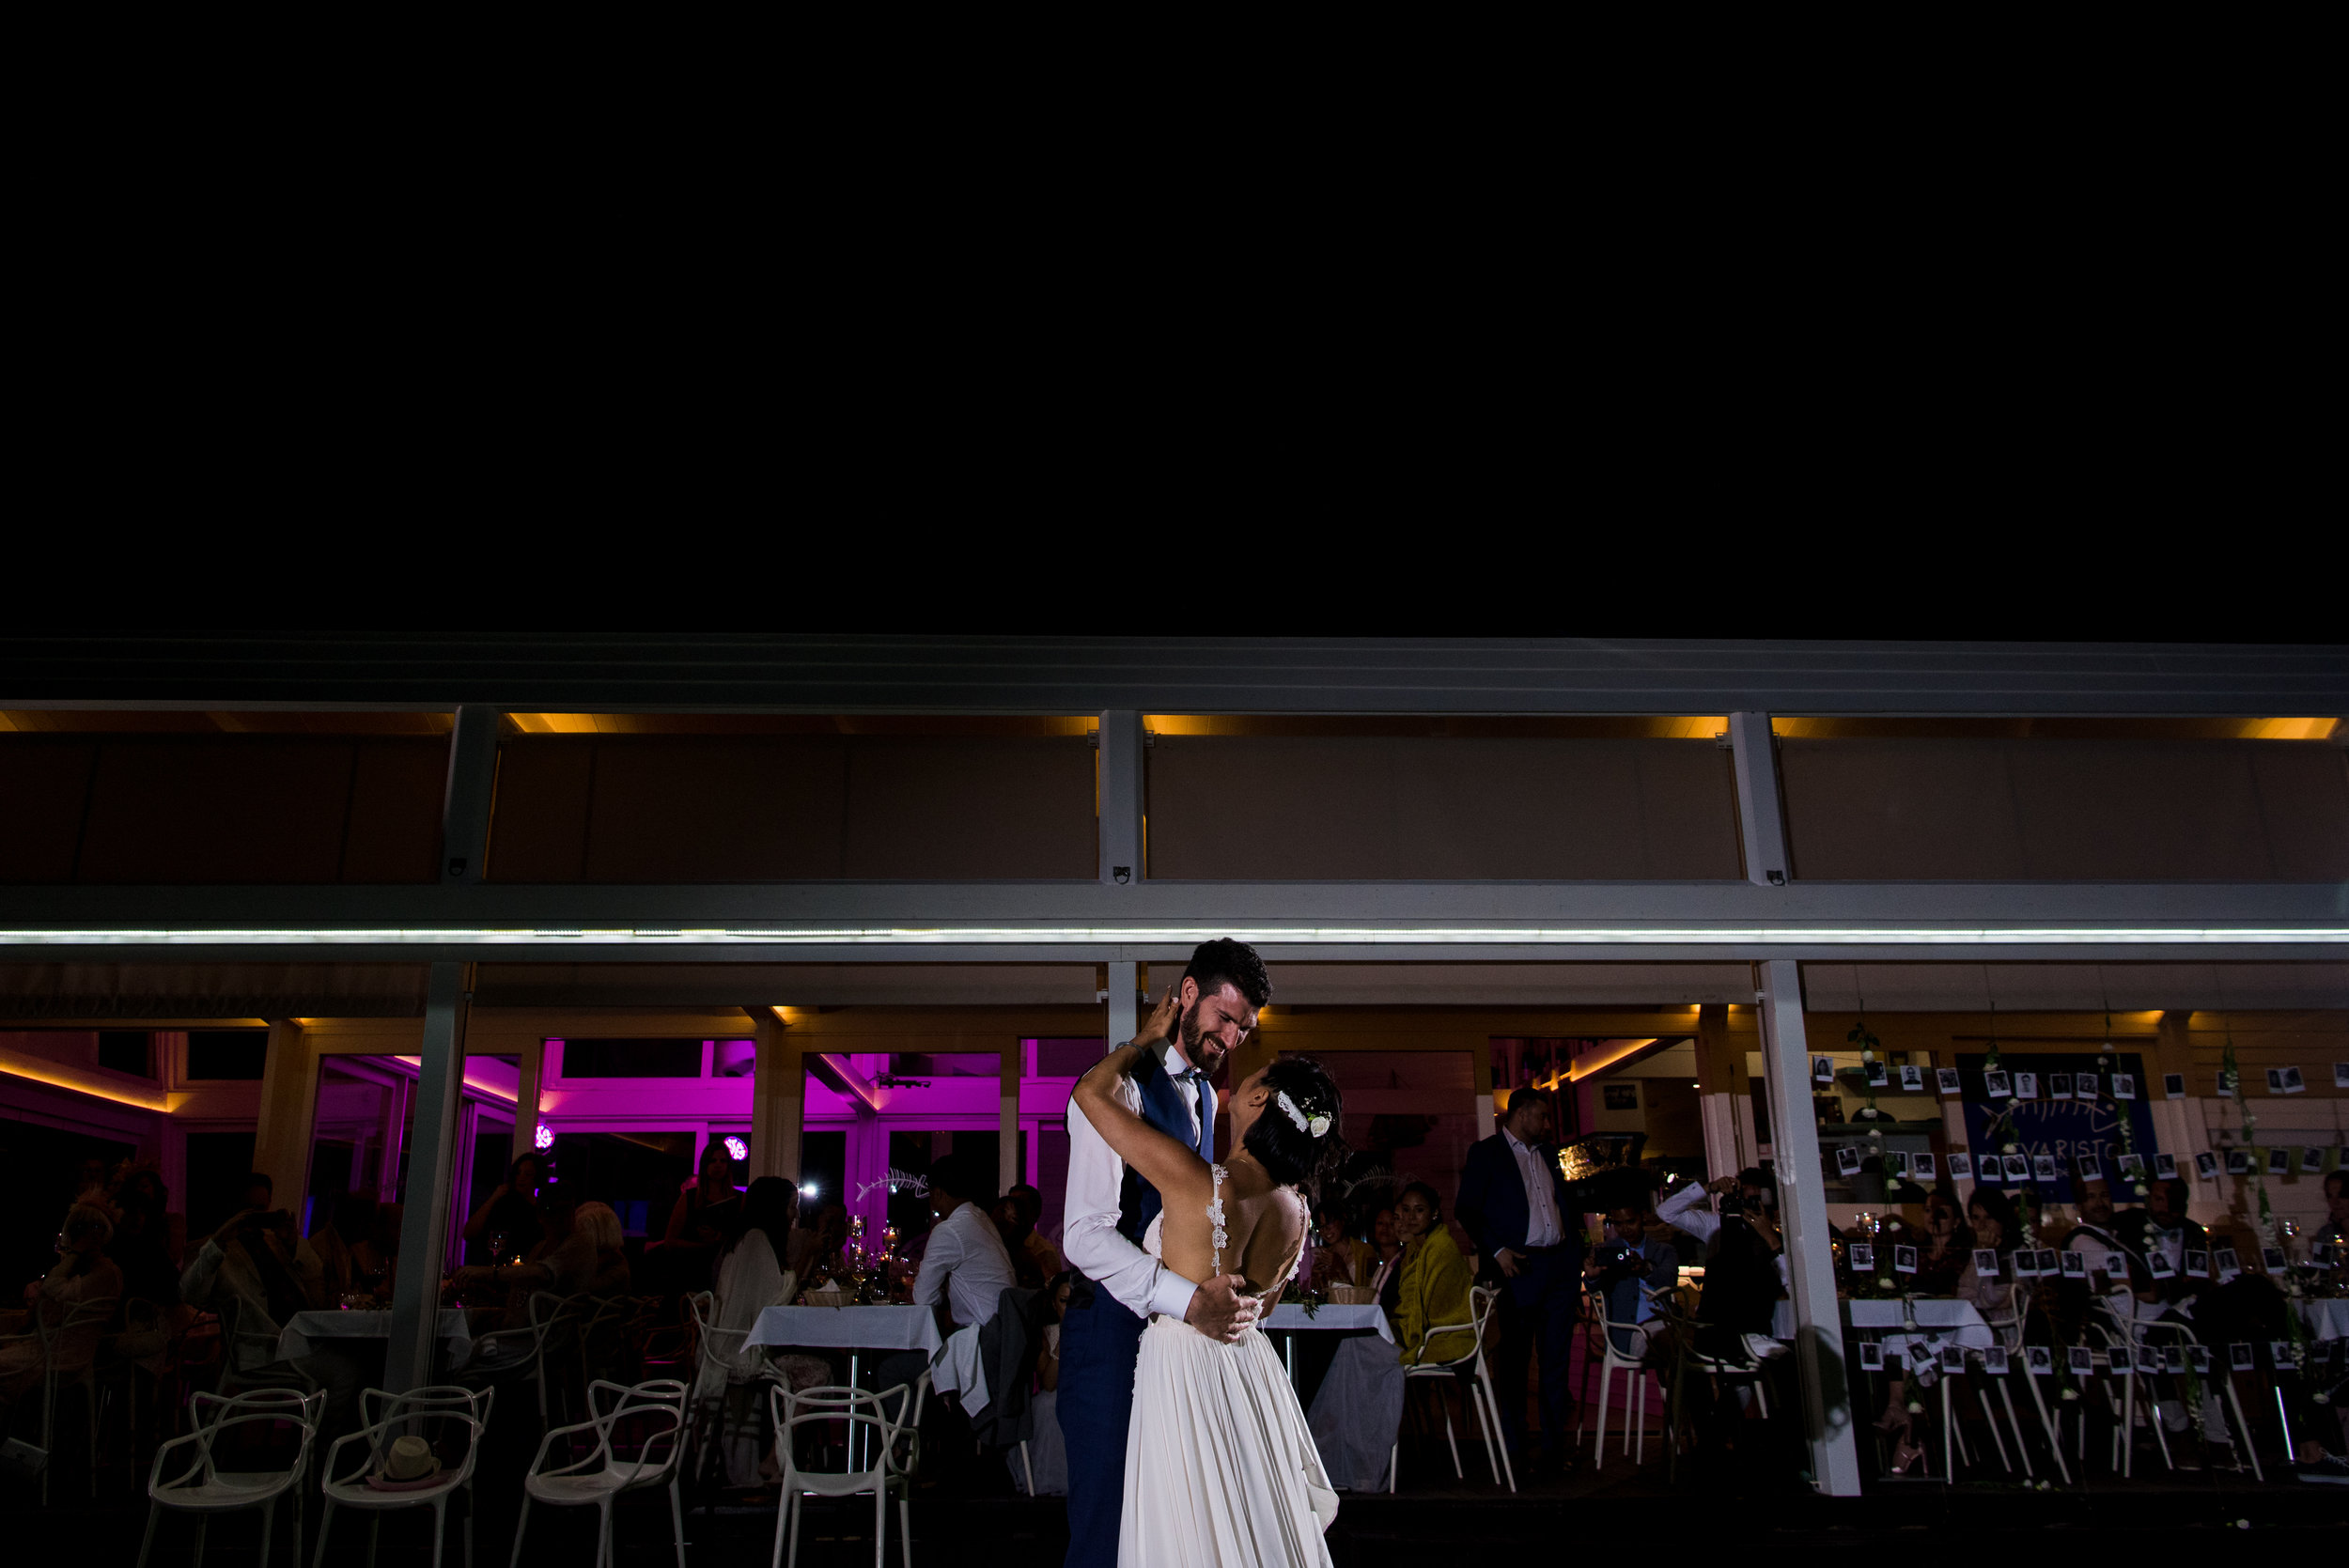 minty-frank-wedding-favorites-187.jpg